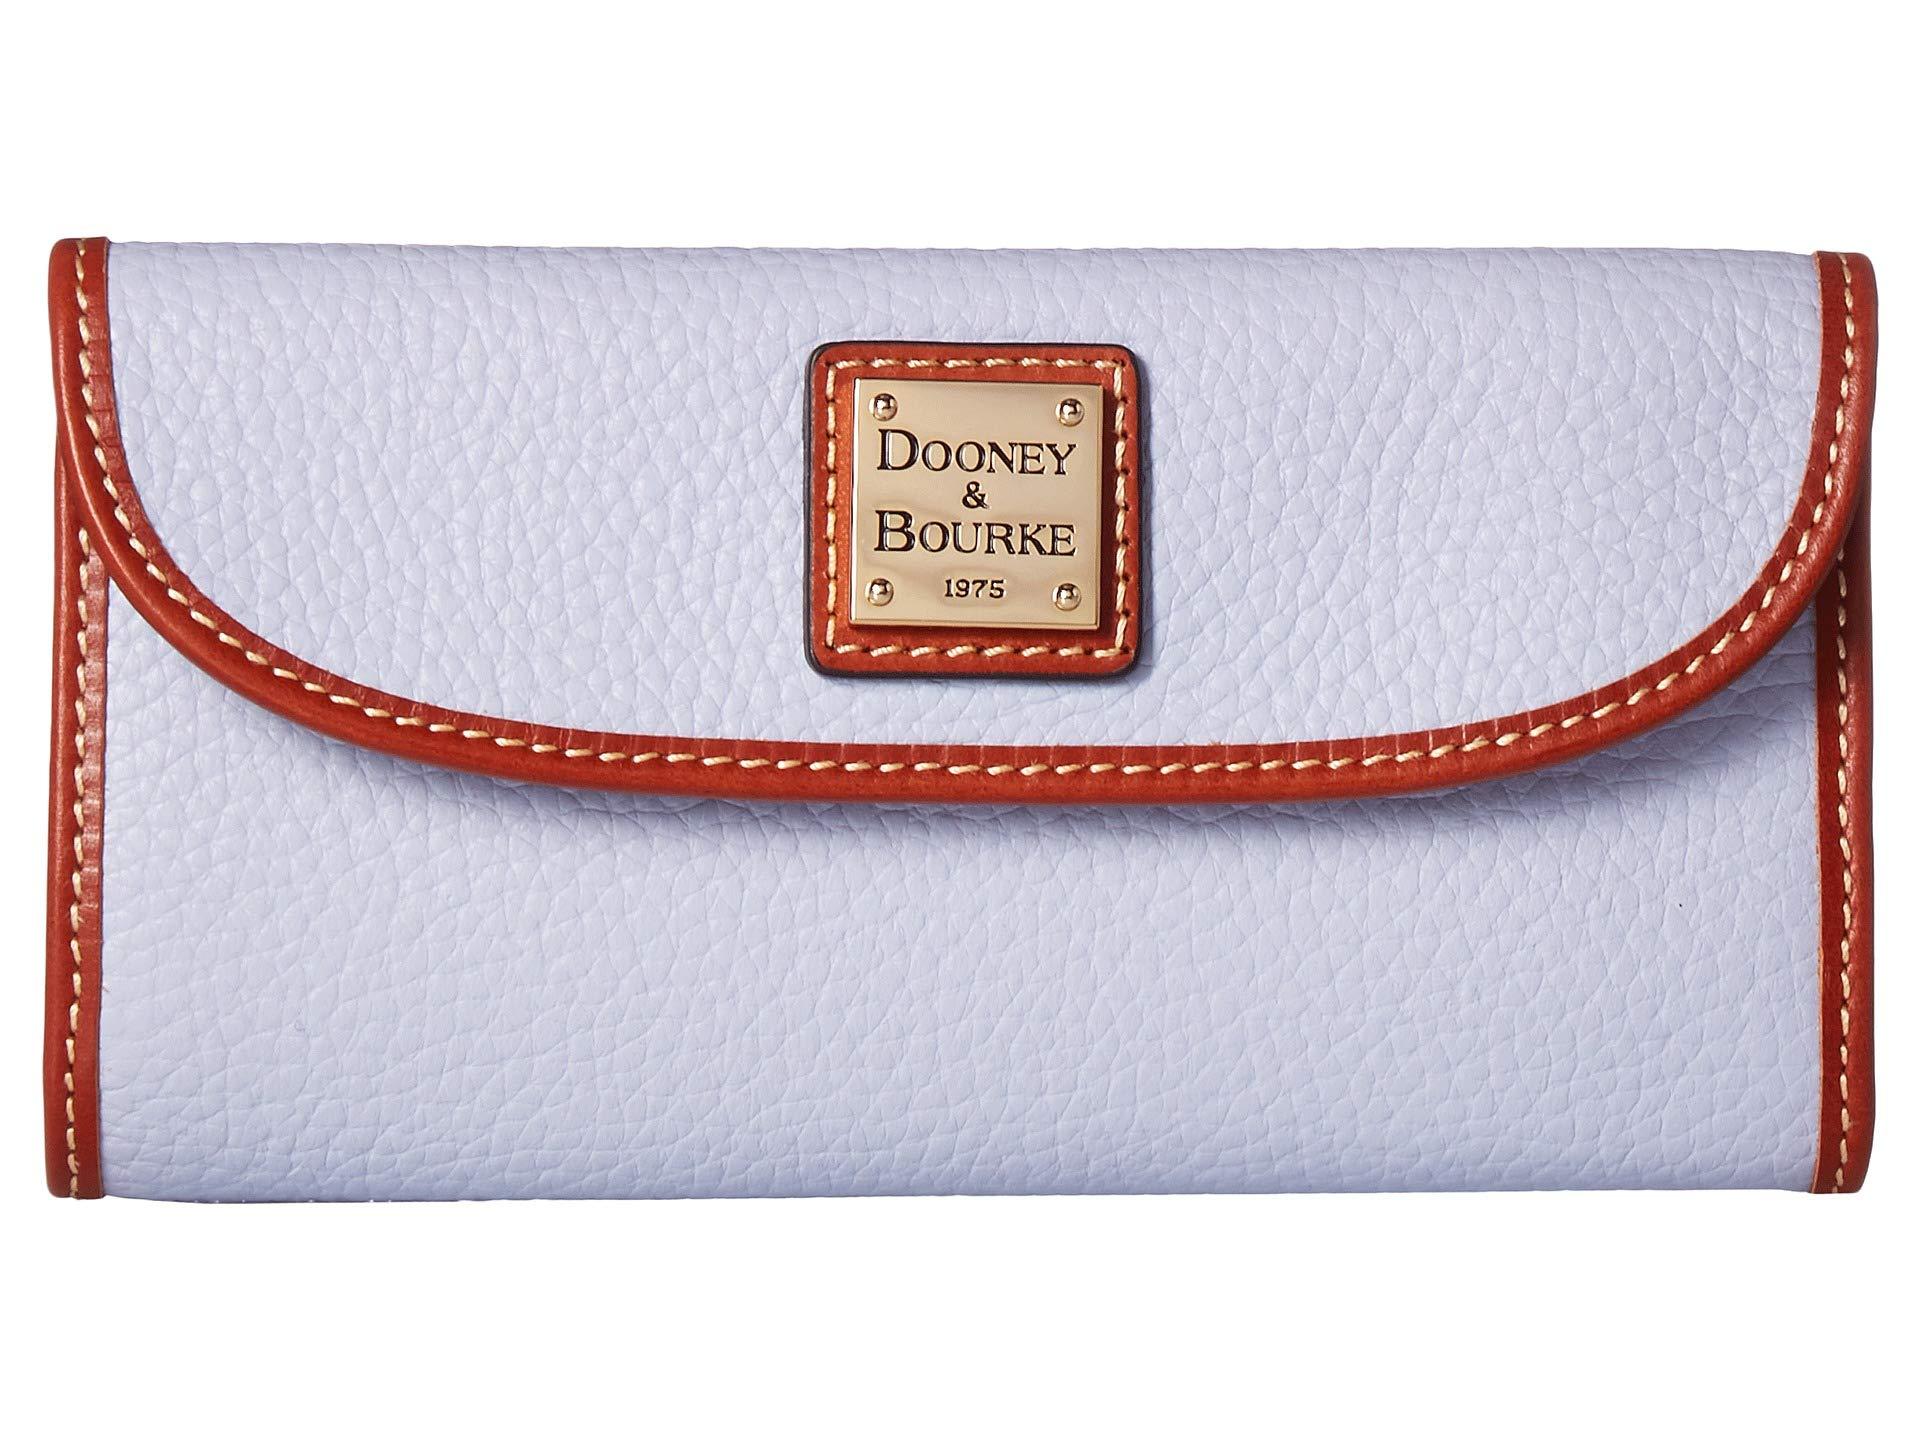 Dooney & Bourke Pebble Grain Continental Clutch Wallet, Glacier Blue